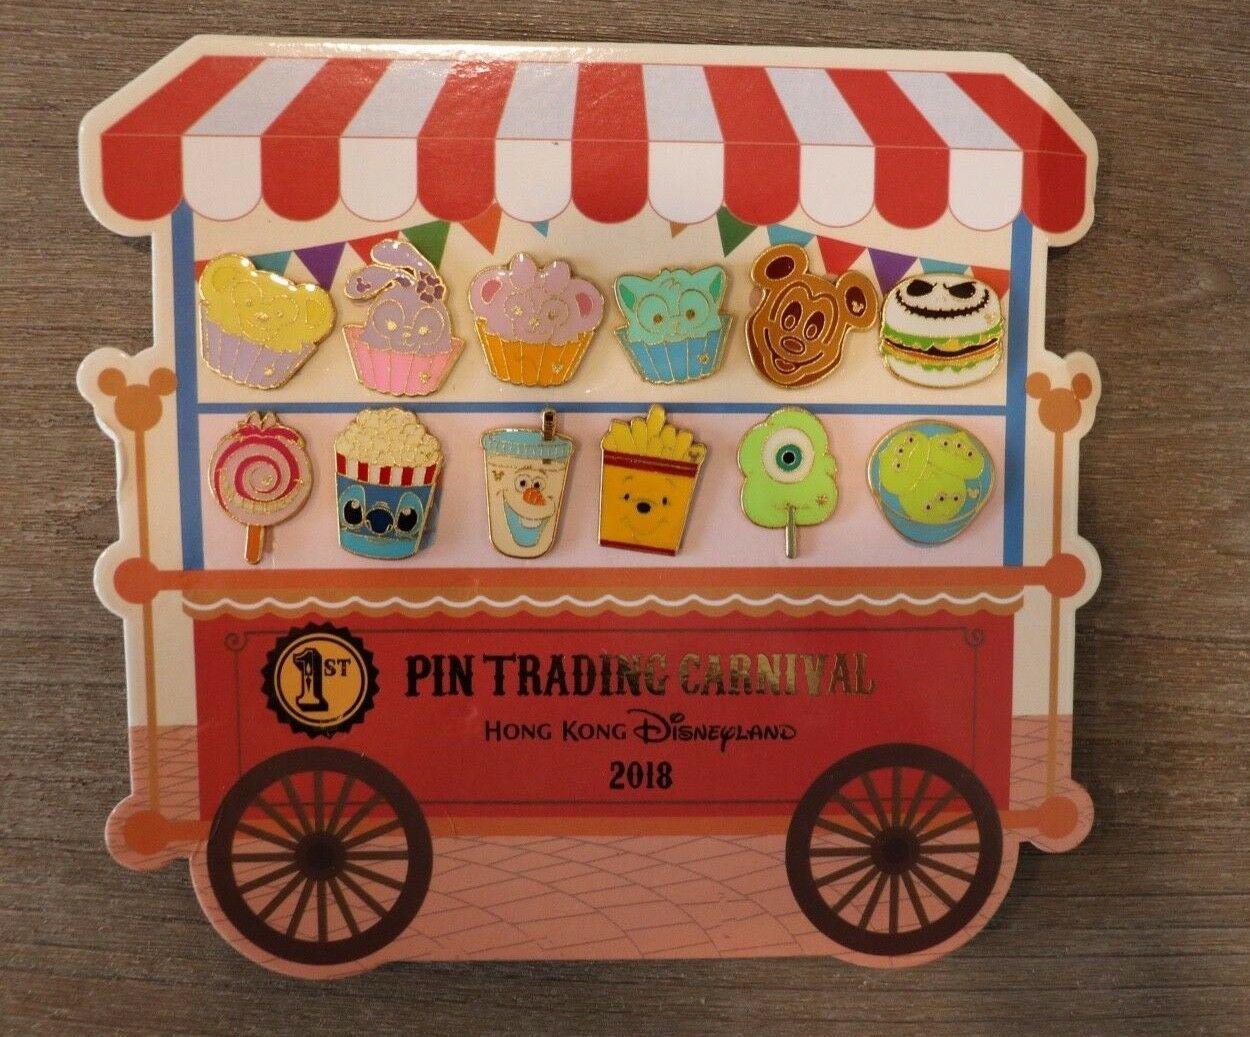 Hkdl Hong Kong Disneyland Disney Pin Intercambio Carnaval 2018 Alimentos Juego